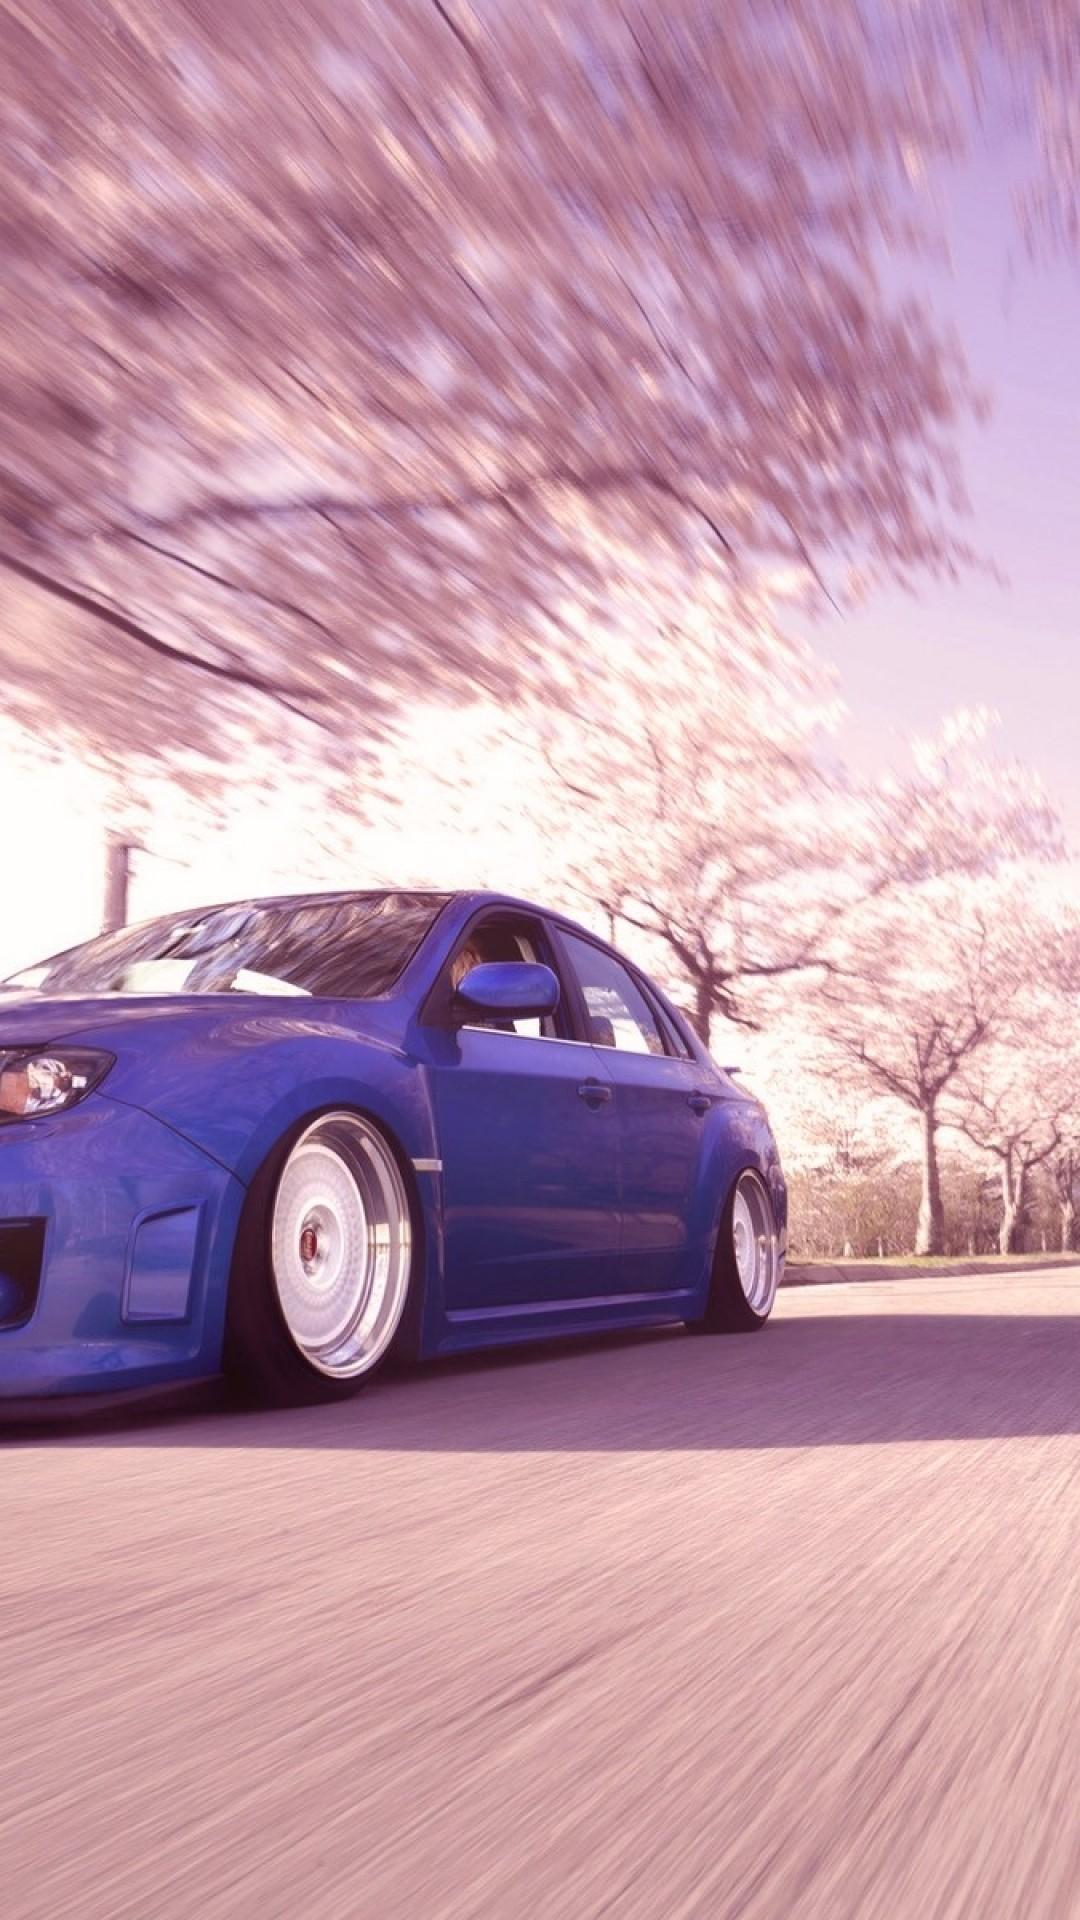 Subaru Wrx Sti, Blurred, Trees, Spring, Cars